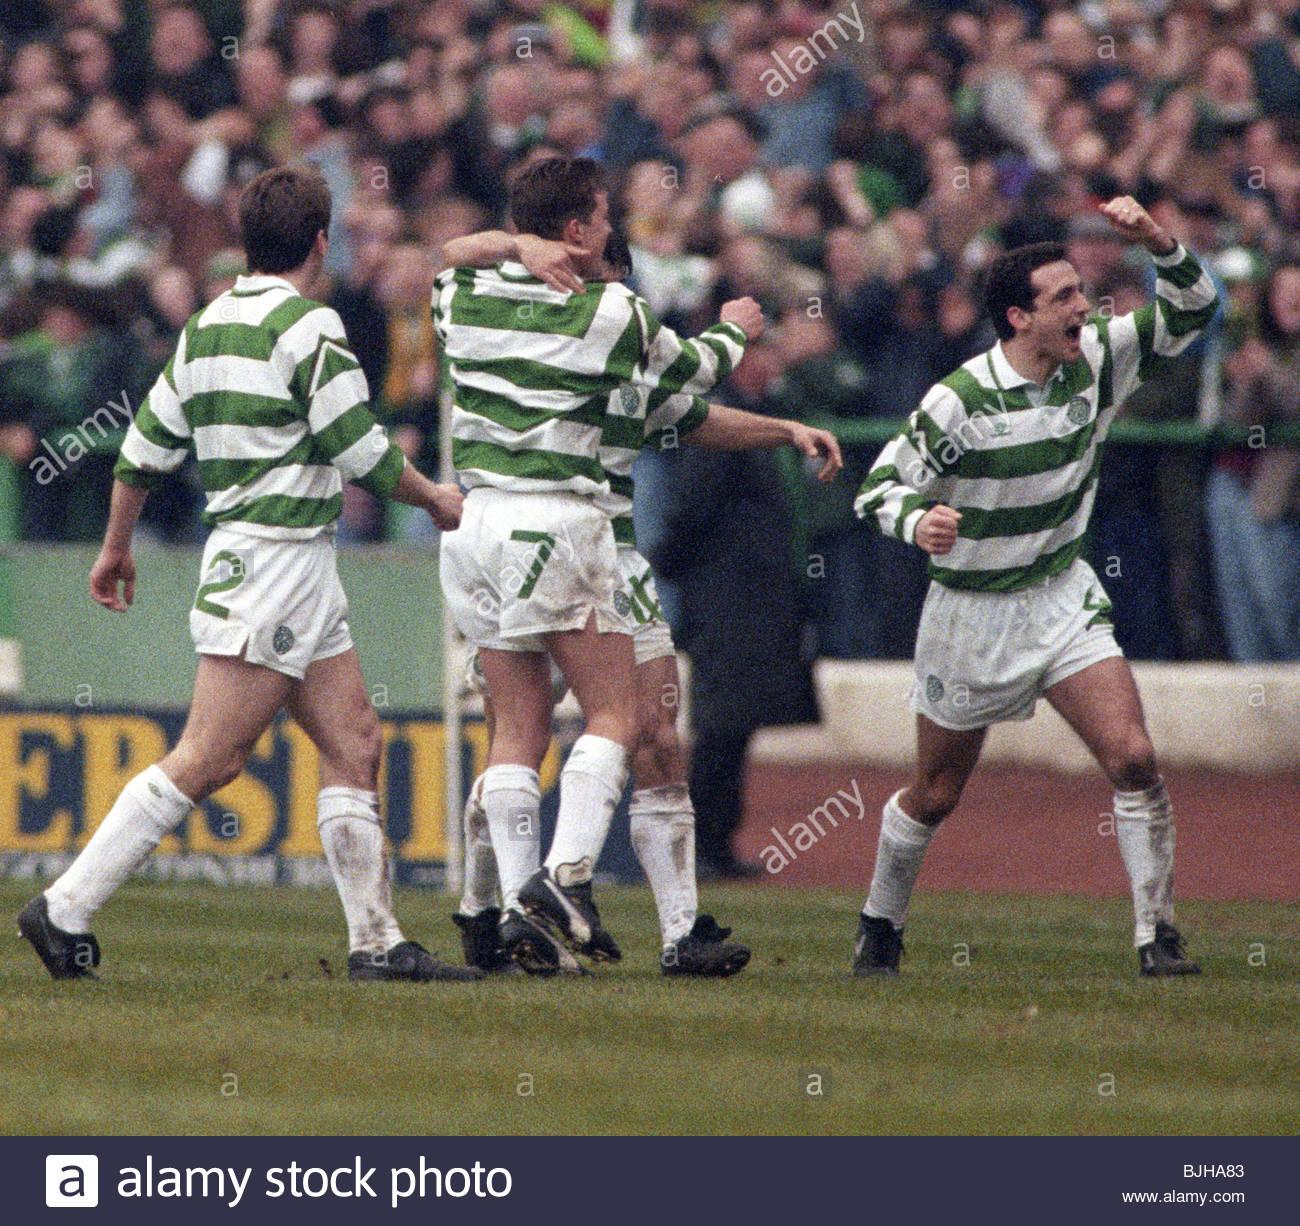 20/03/93 PREMIER DIVISION CELTIC V RANGERS (2-1) CELTIC PARK - GLASGOW Paul McStay (right) and his Celtic team-mates - Stock Image